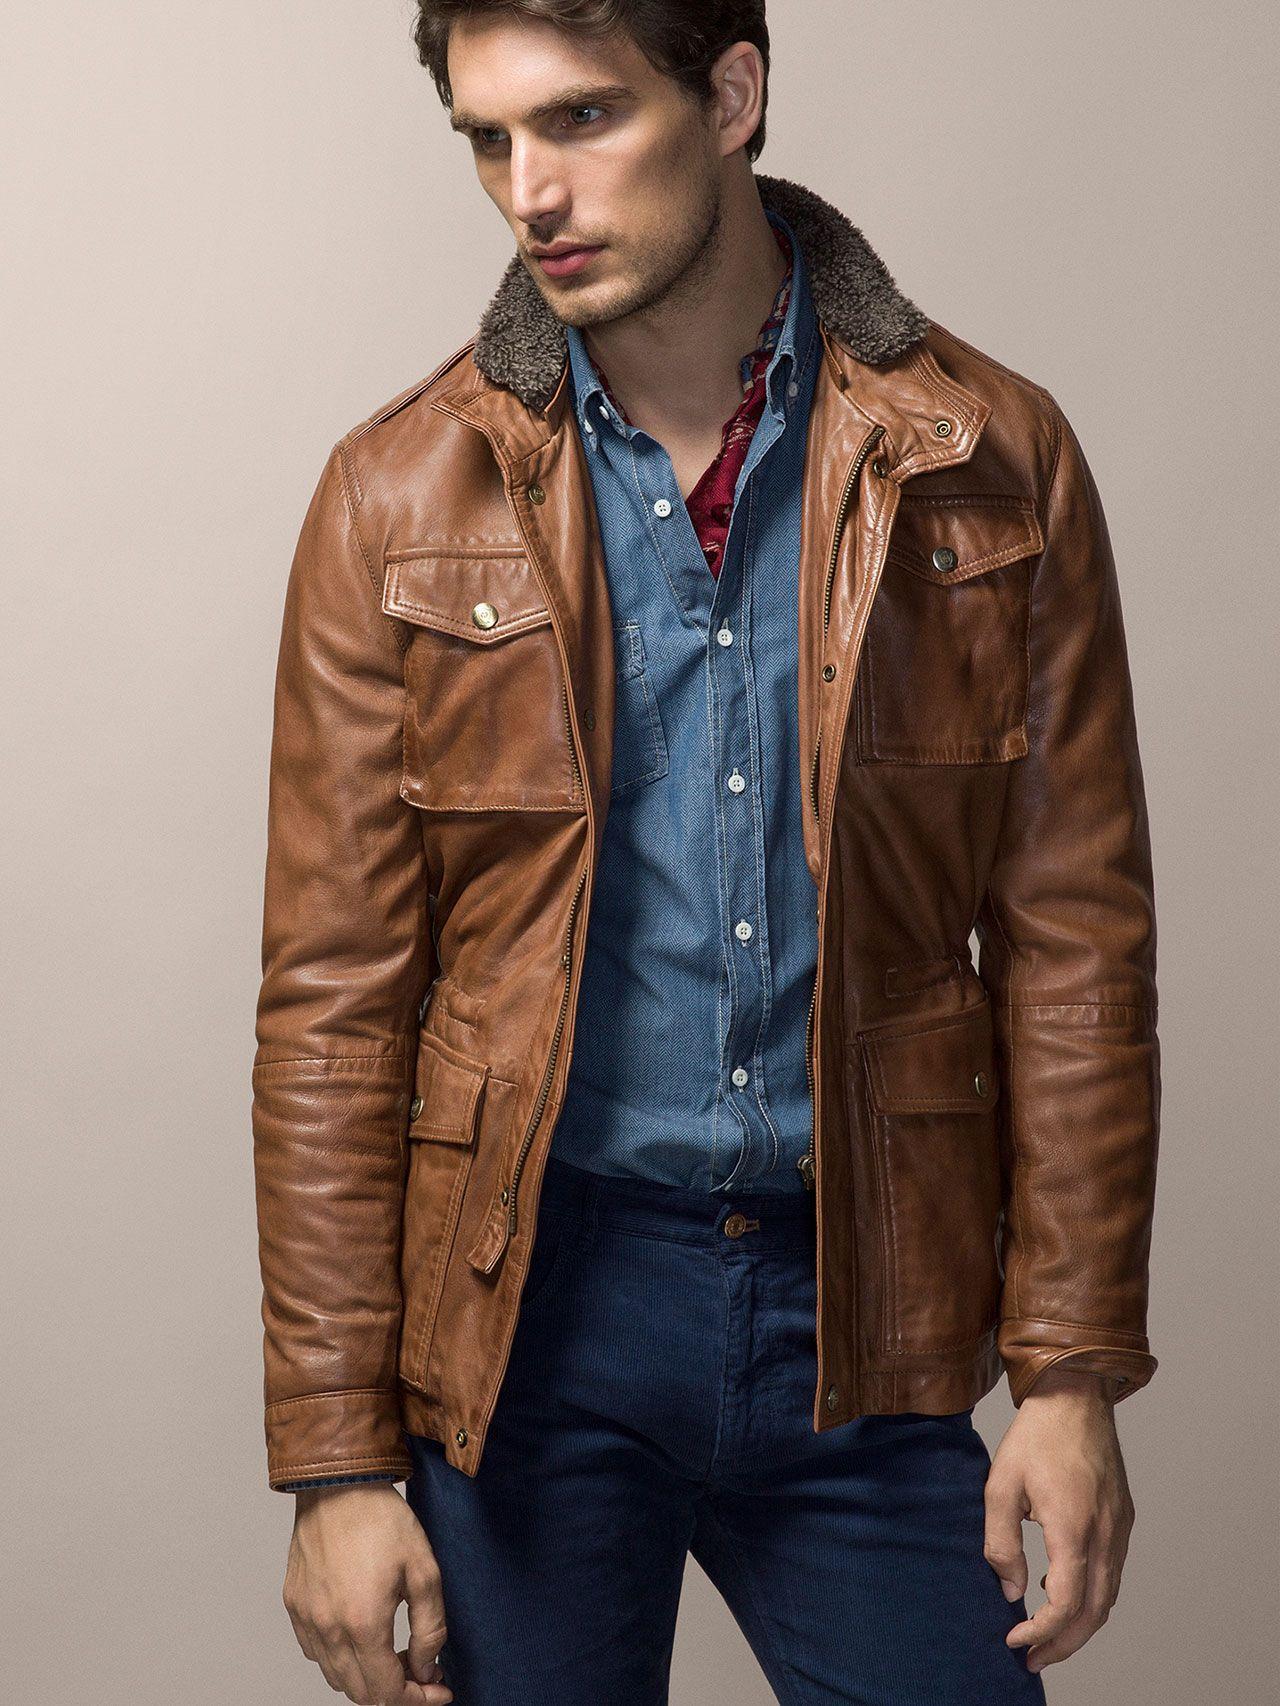 Nappa Leather Field Jacket With Merino Collar Massimo Dutti Leather Jacket Men Leather Jacket Outfit Men Mens Jackets [ 1706 x 1280 Pixel ]